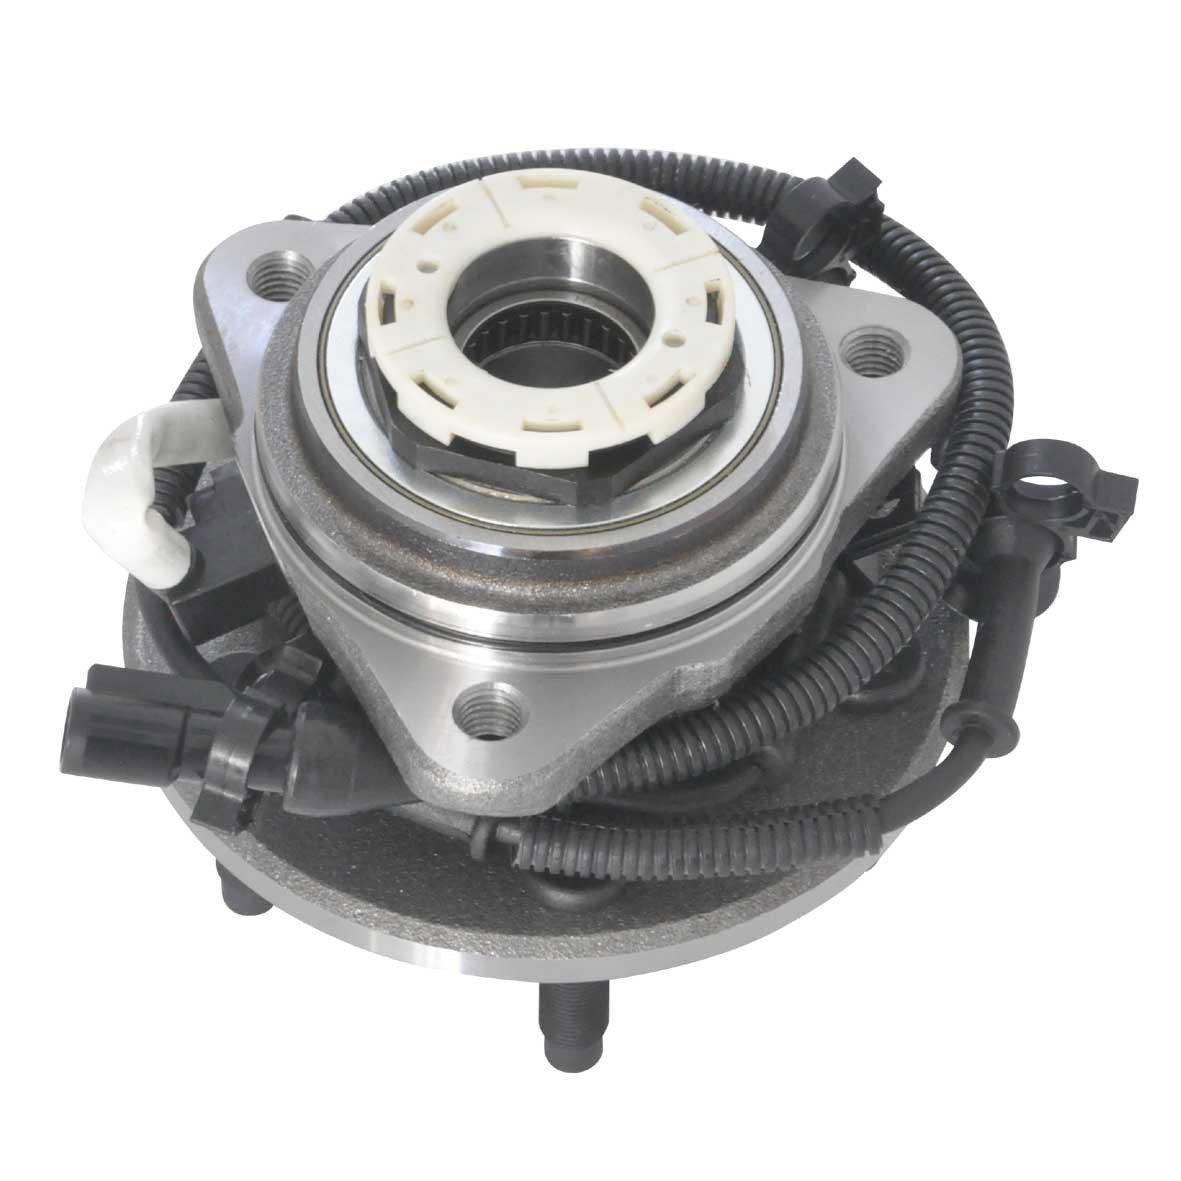 Amazon.com: DRIVESTAR 515027 New Front Auto Locking Hub Wheel Hub & Bearing  for 98-00 Ranger 4WD 4x4 w/ ABS: Automotive